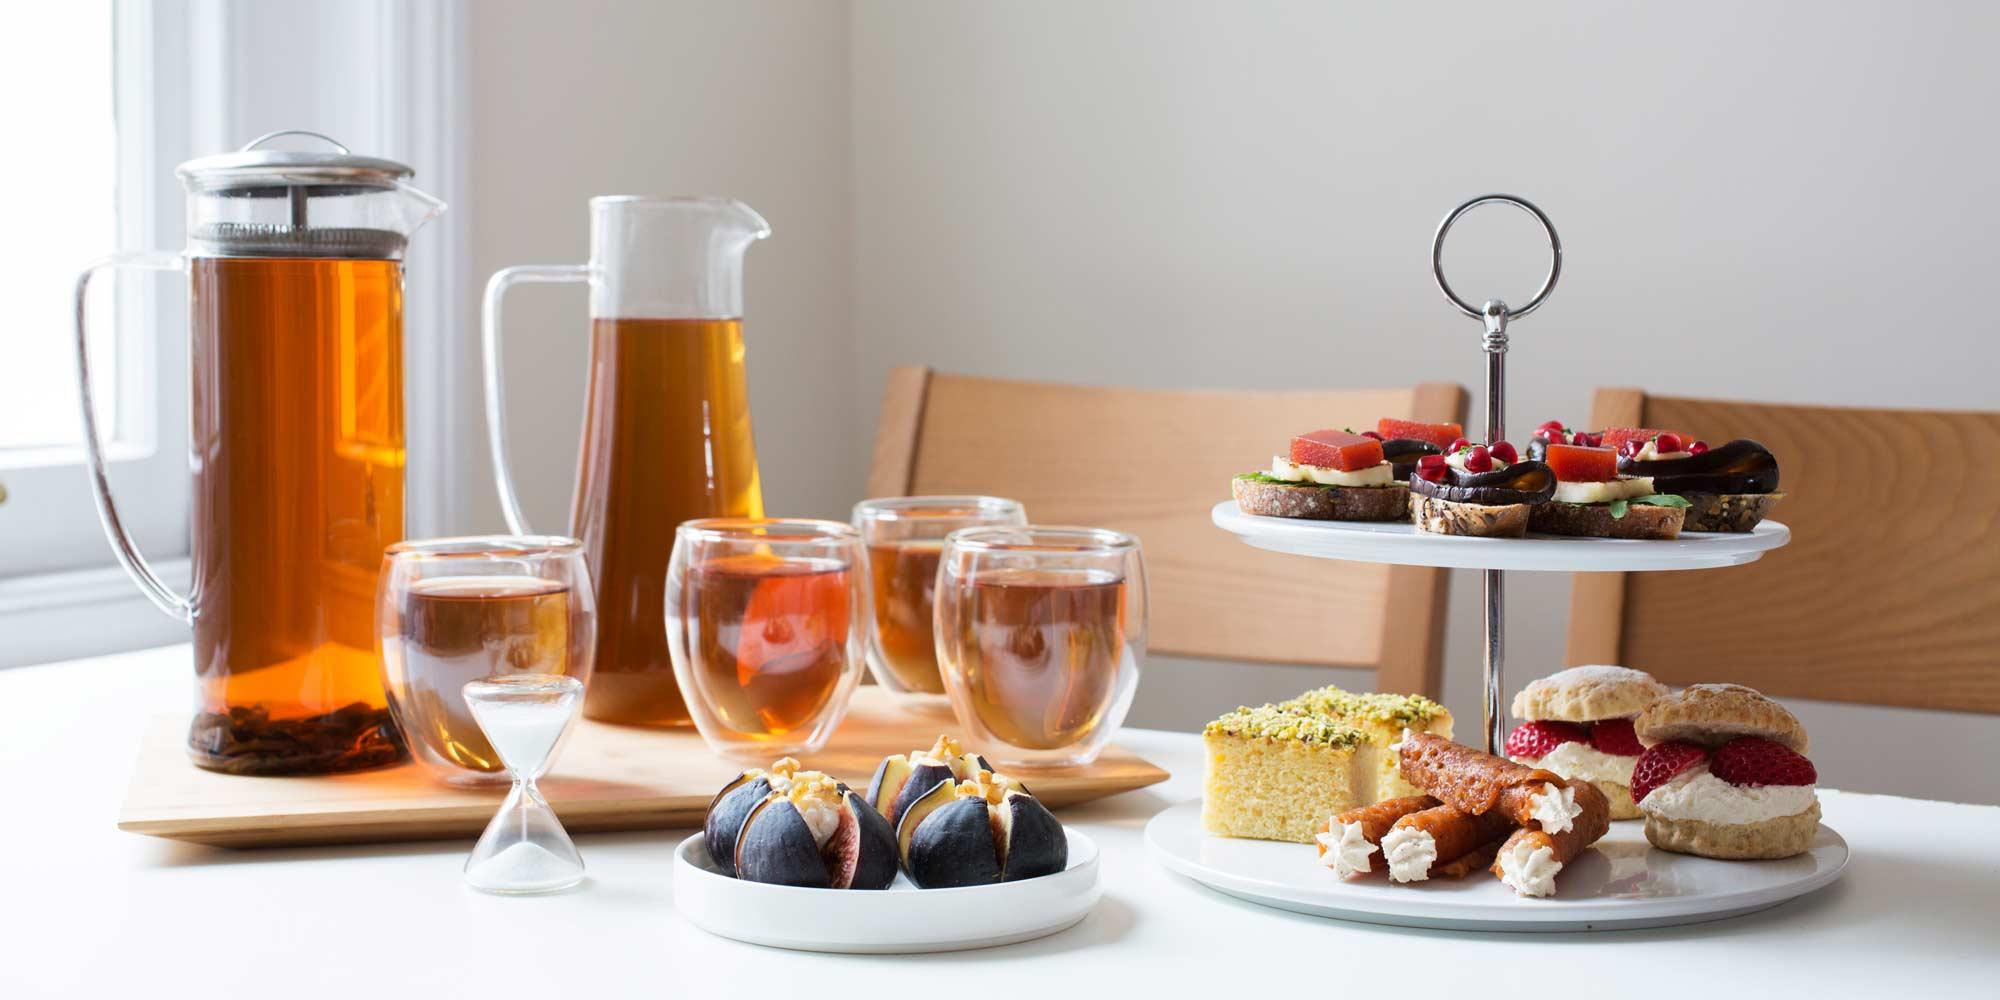 Array of afternoon tea treats